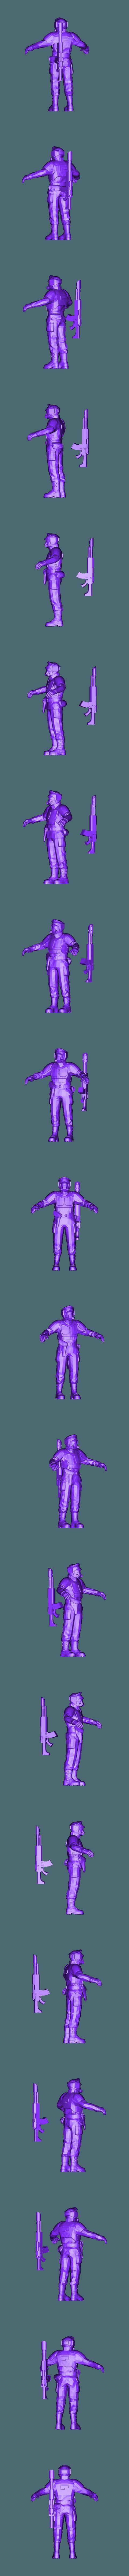 ThatEvilOnes_Printable_Cadian_Base.obj Download free OBJ file Community Guardsmen Project Hub • Design to 3D print, ThatEvilOne